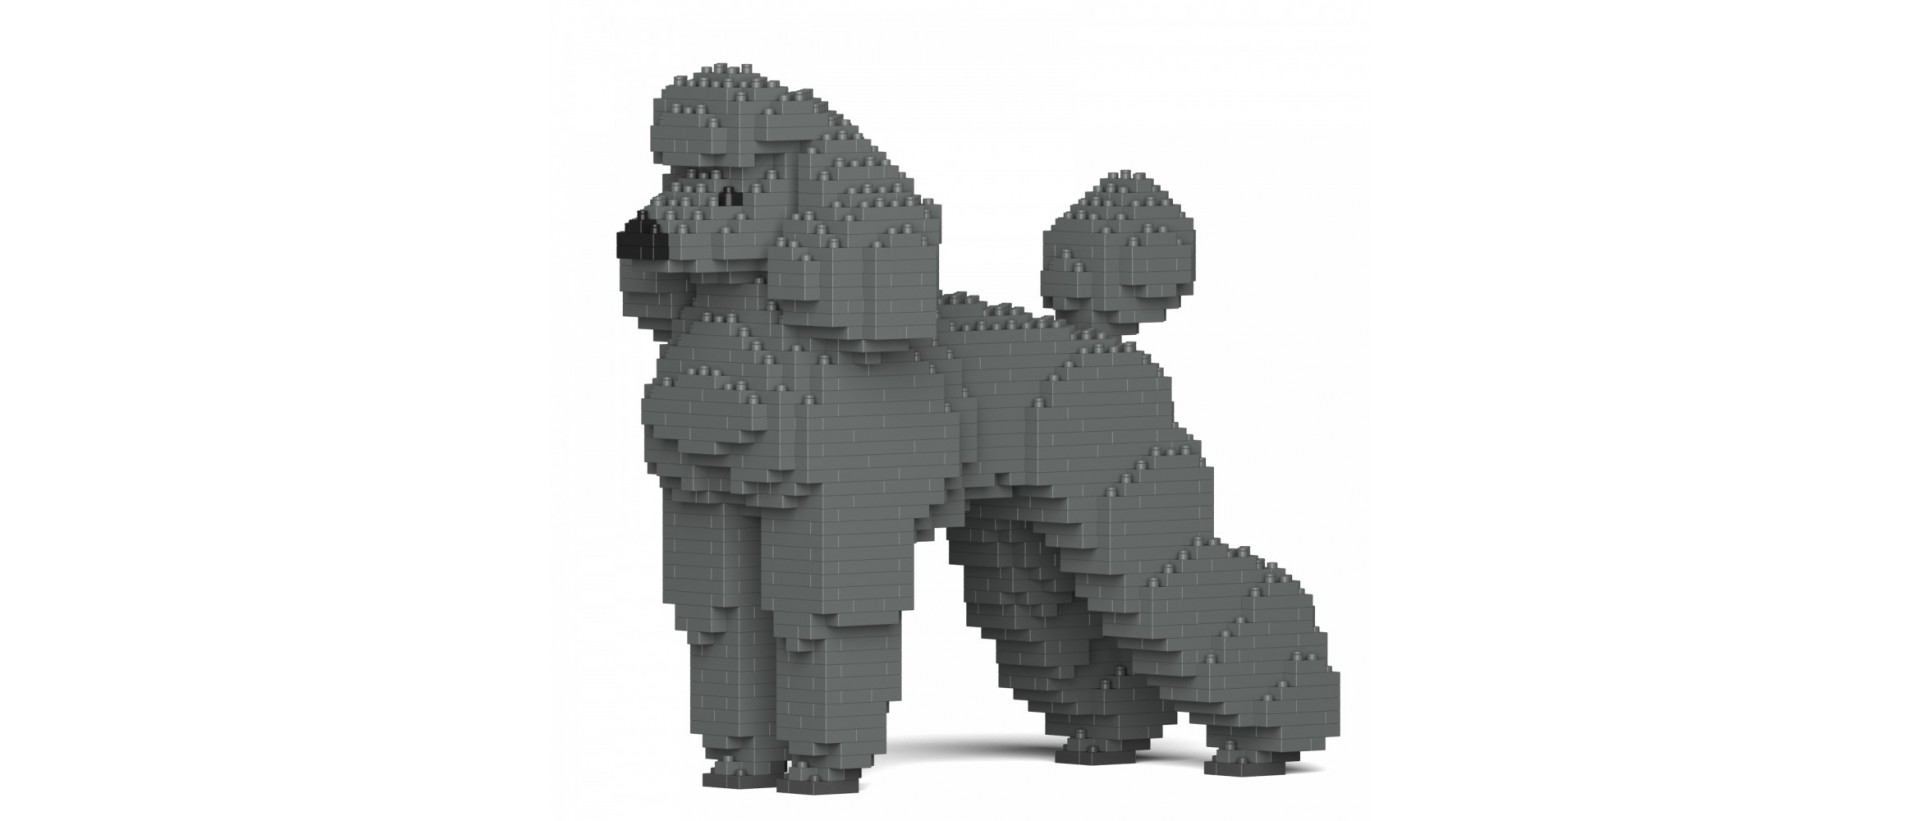 Standard Poodle S04-M03